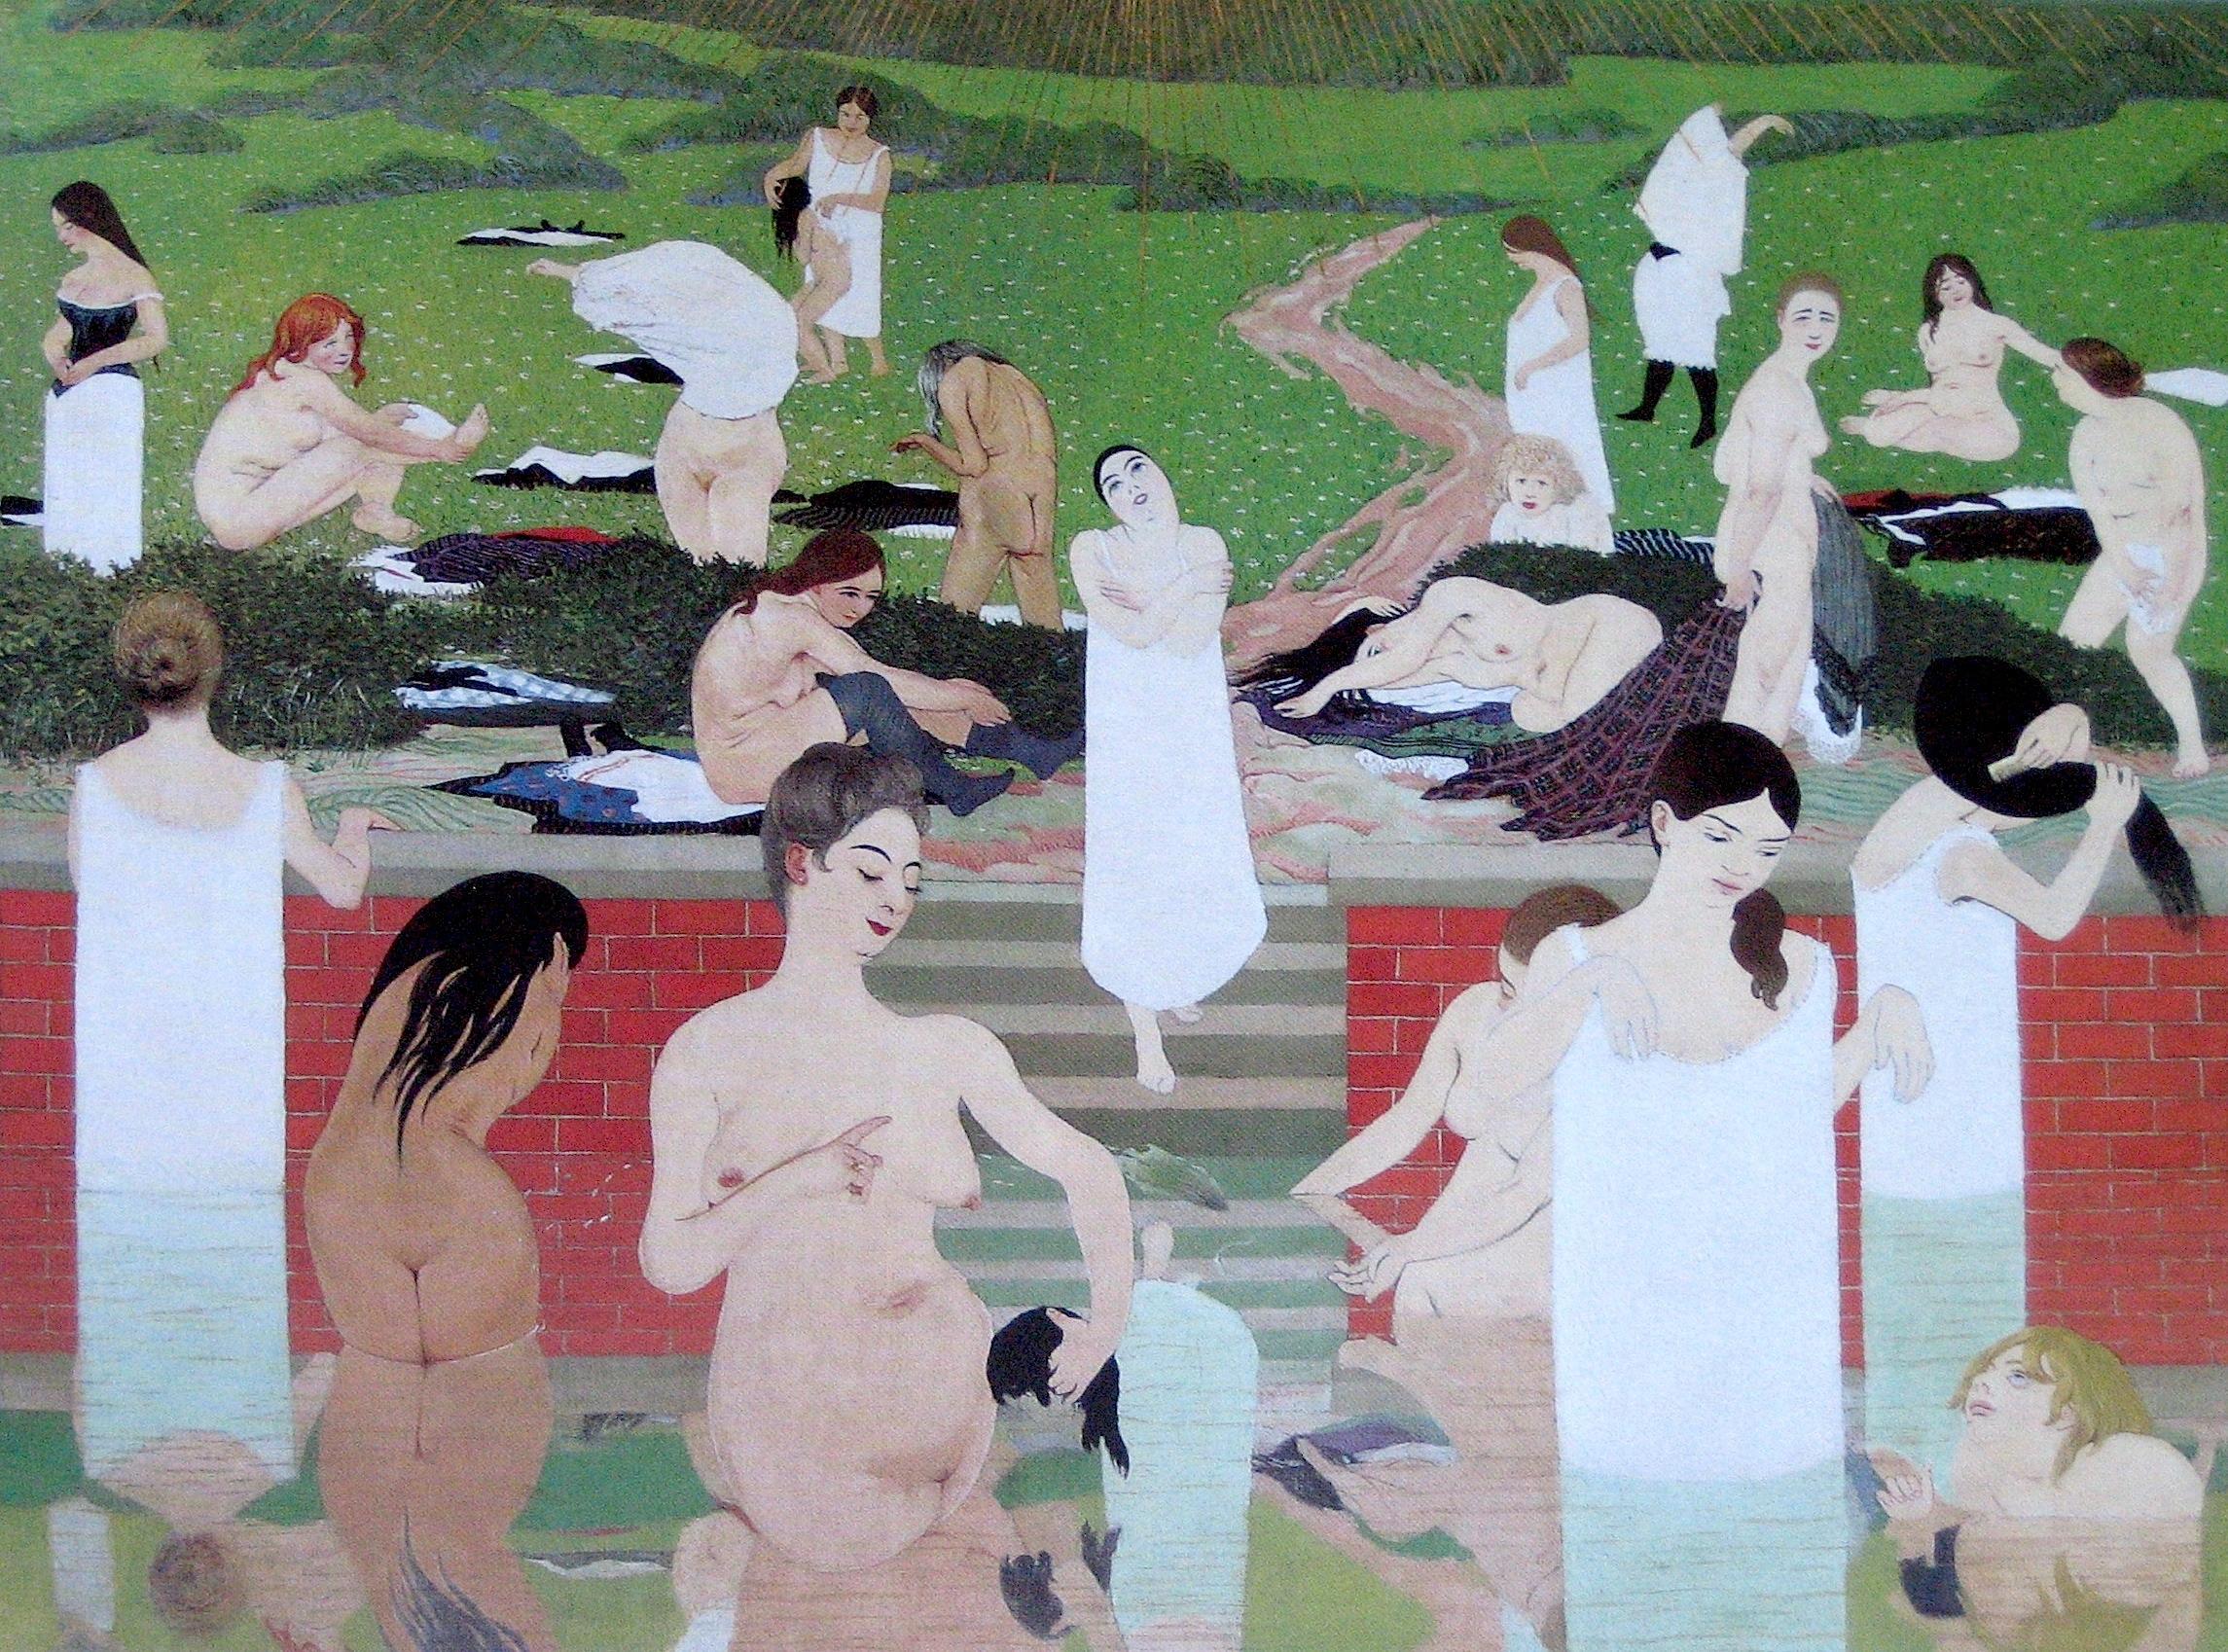 THE BATH,SUMMER EVENING  by Felix Valloton, 1892